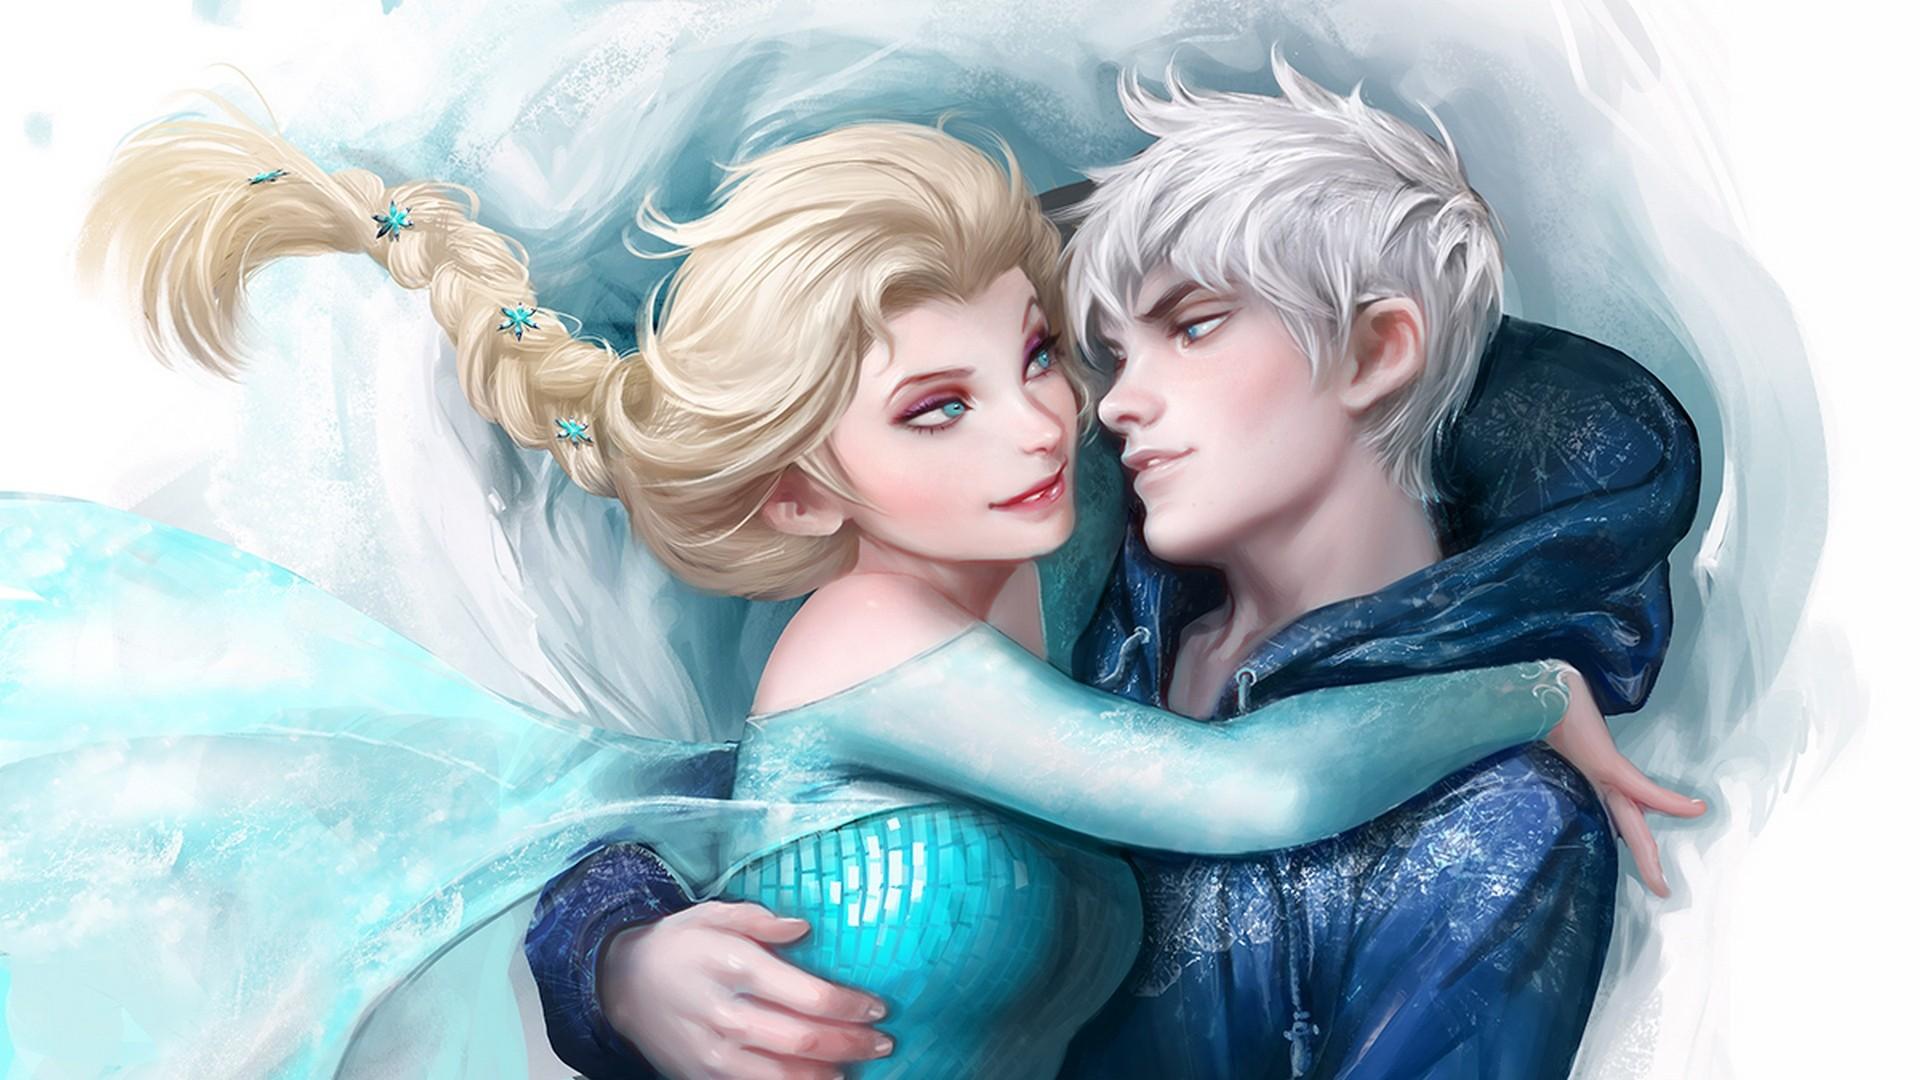 Wallpaper jack frost, winter spirit, frozen, elsa, snow queen,  rise